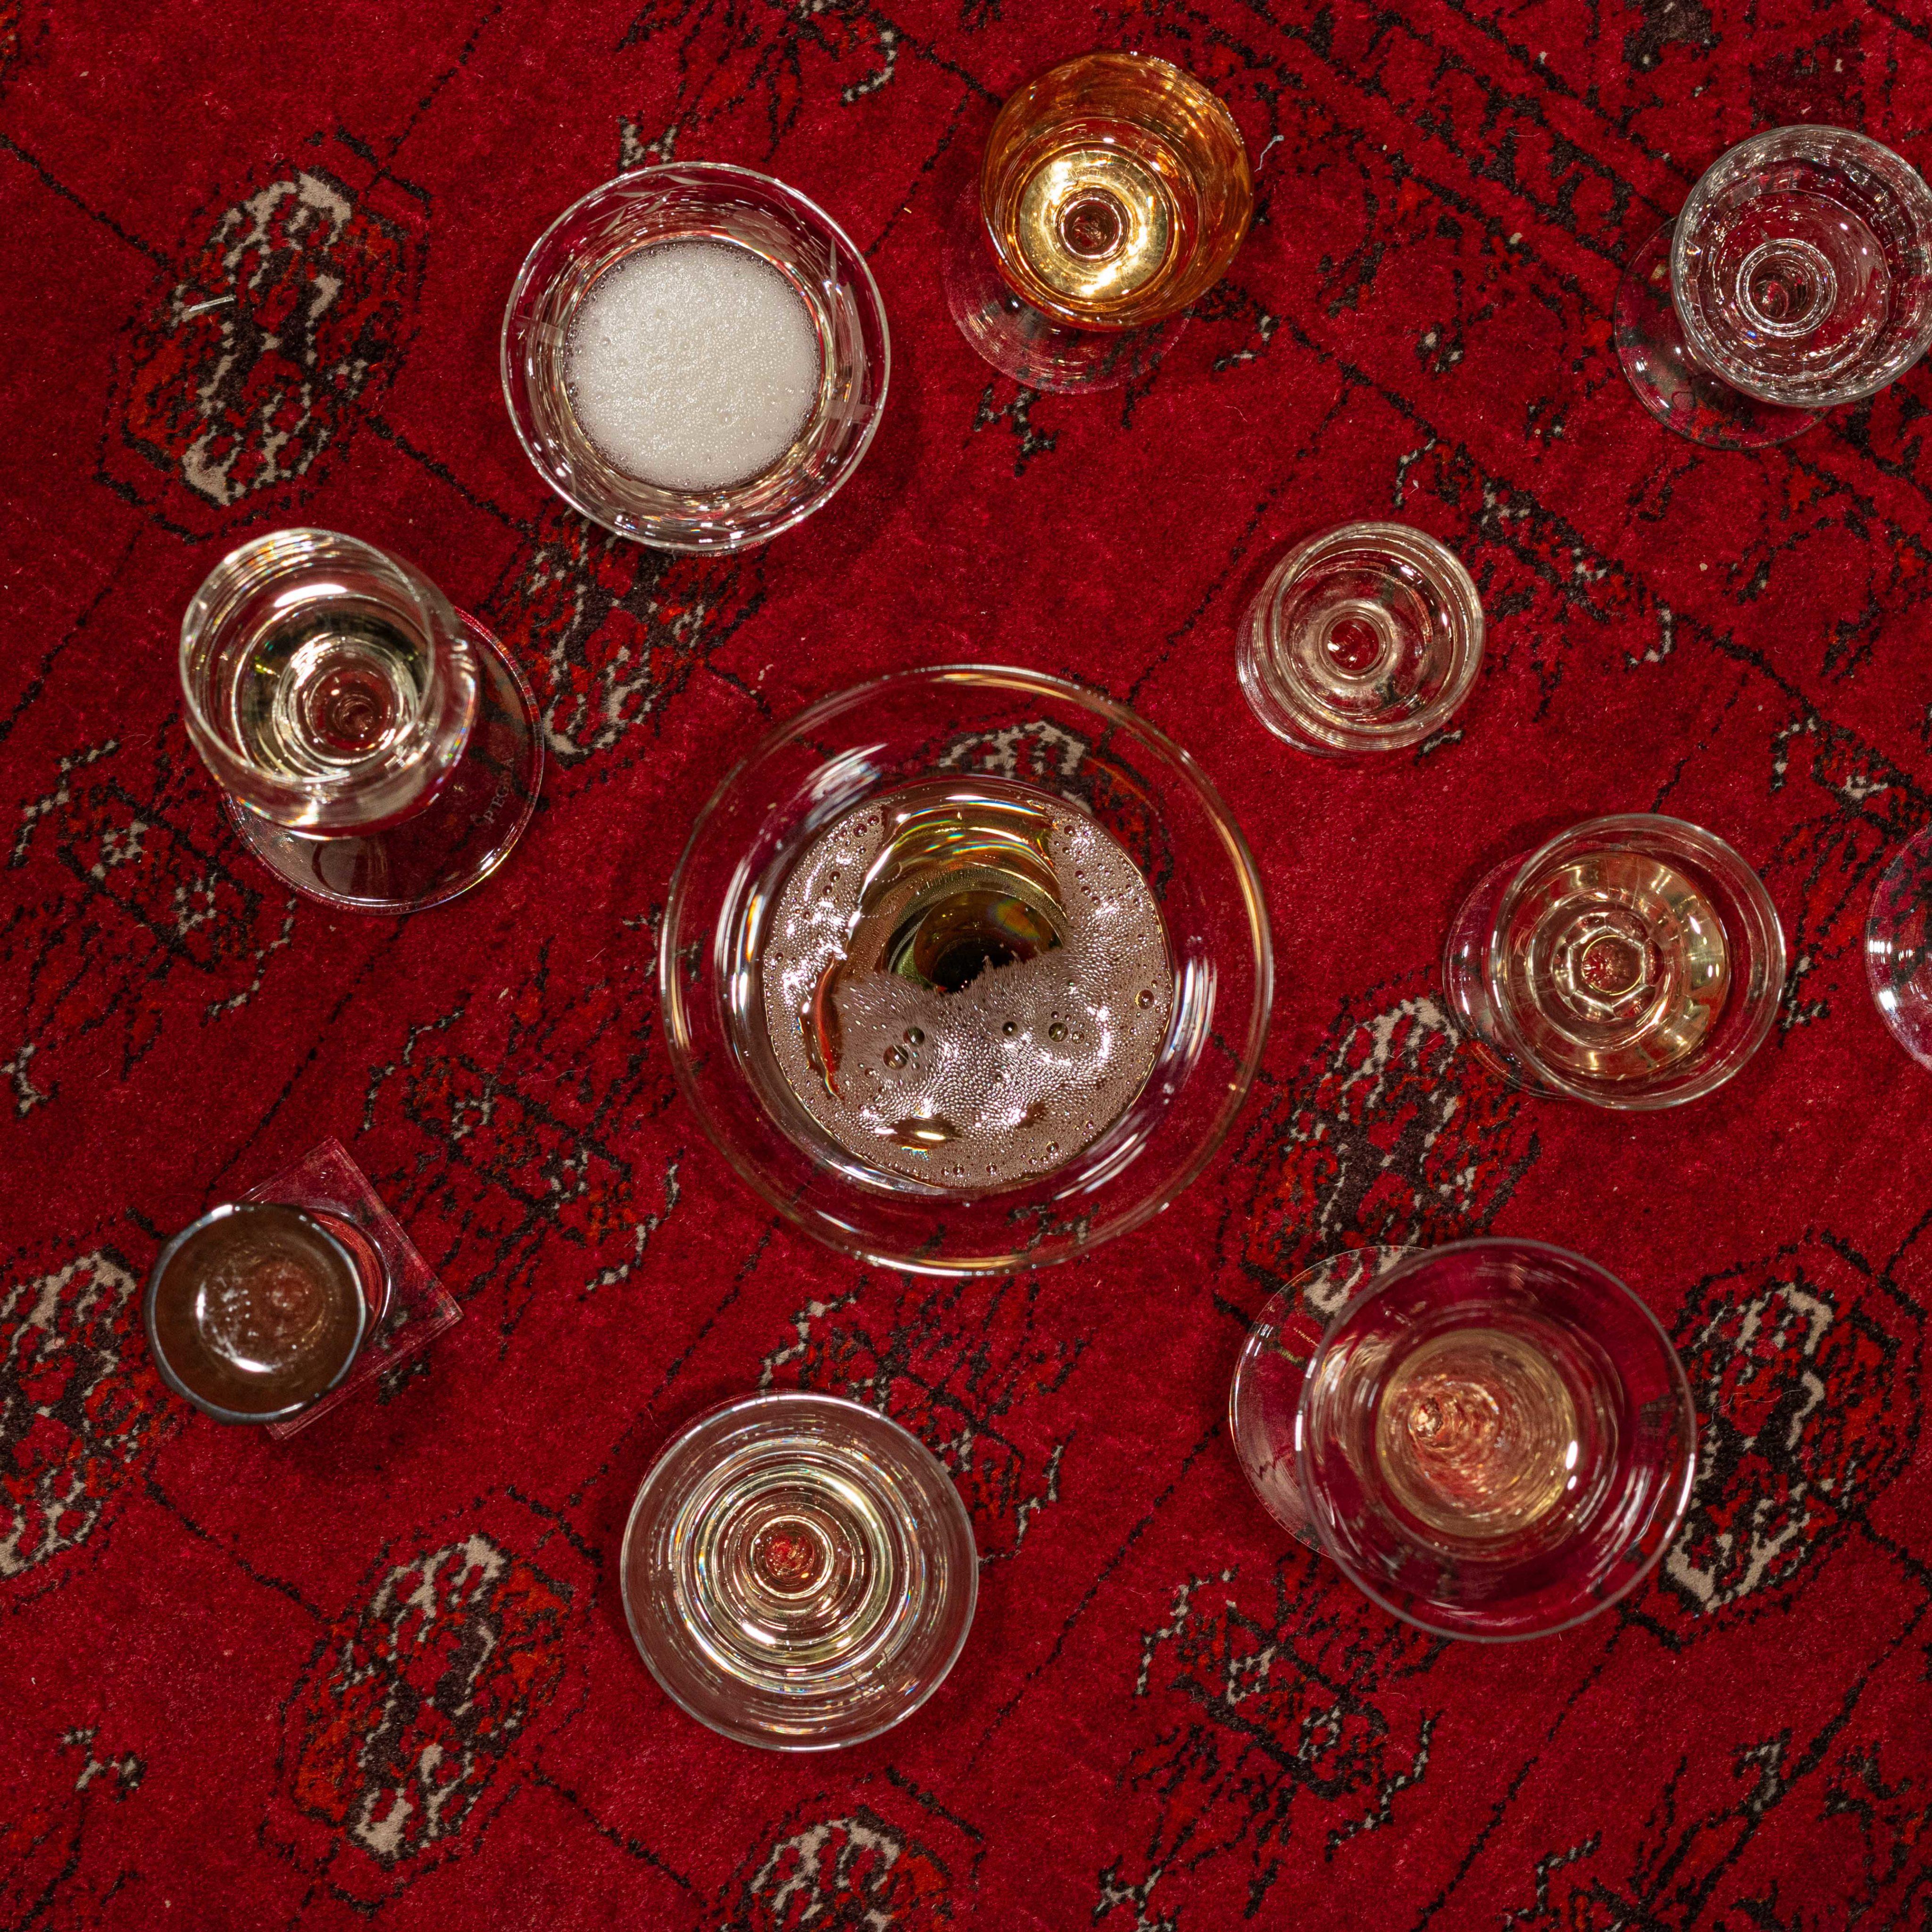 Comtess Marie de France   Paul Bara   100% Pinot Noir   Grand Cru Bouzy   Montage de Reims